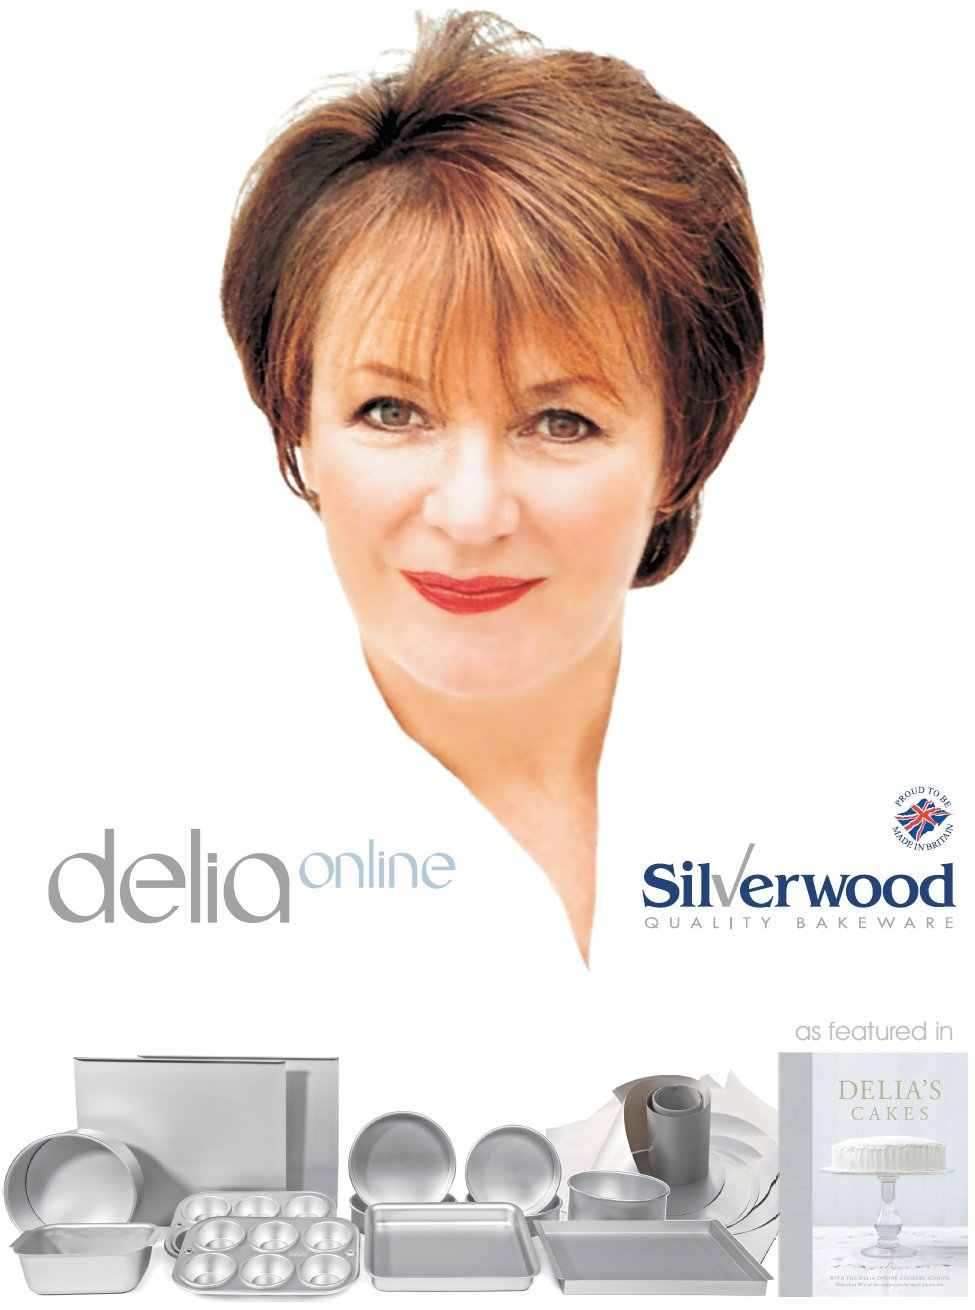 Alan Silverwood Delia Smith Silver Anodised Aluminium Bakeware Part Set - 99524